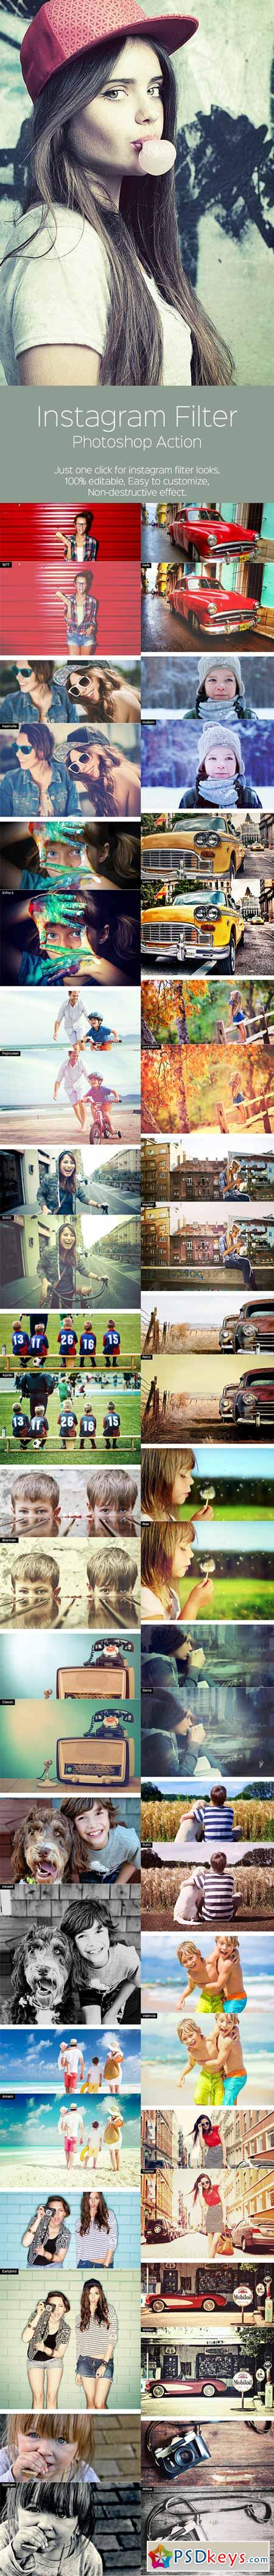 Instagram Filter - Photoshop Action 10014396